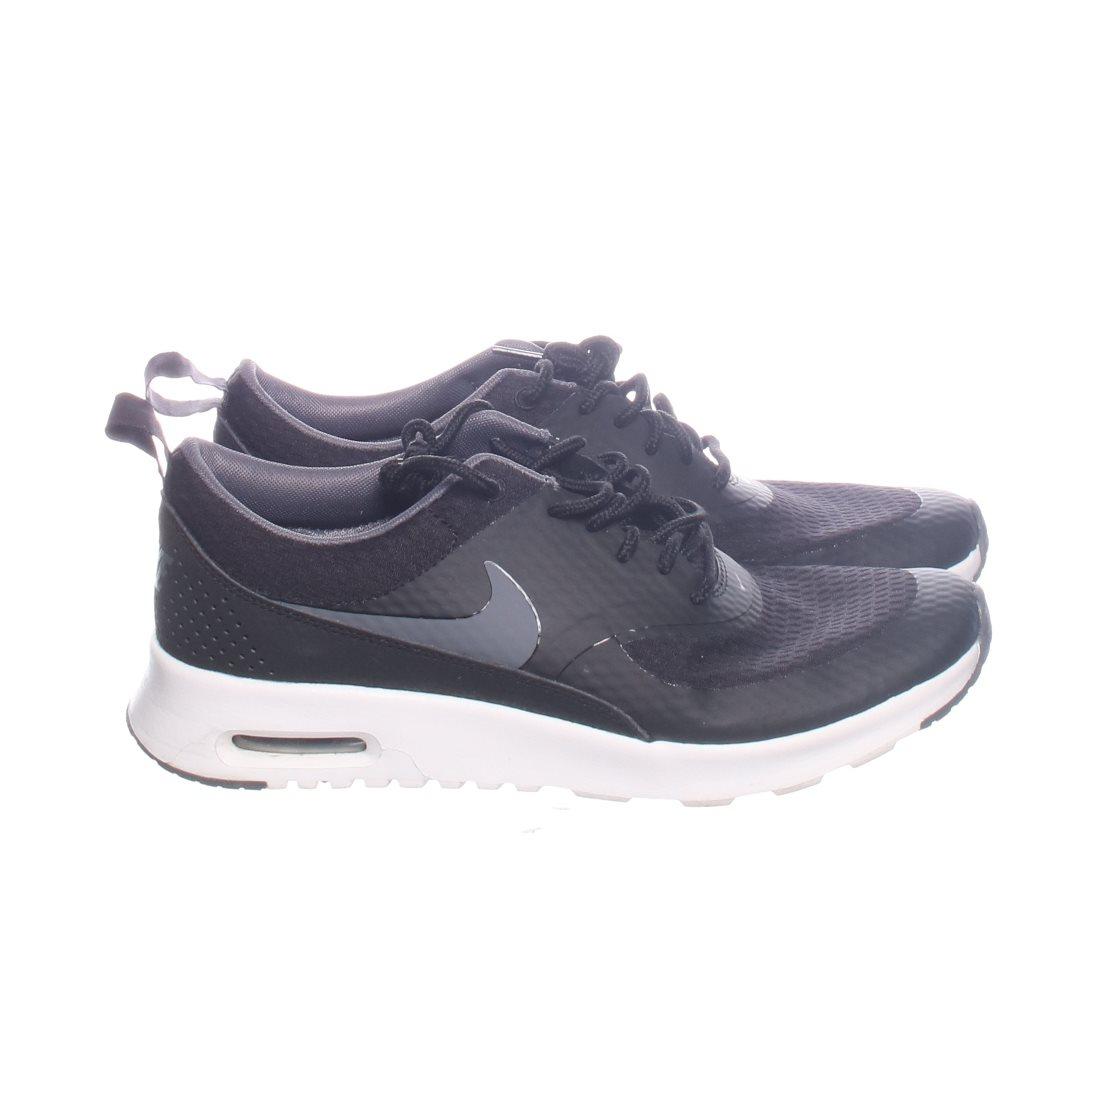 brand new 8b319 c5c2e Nike, Sneakers, Strl  38, AIR MAX THEA, Svart